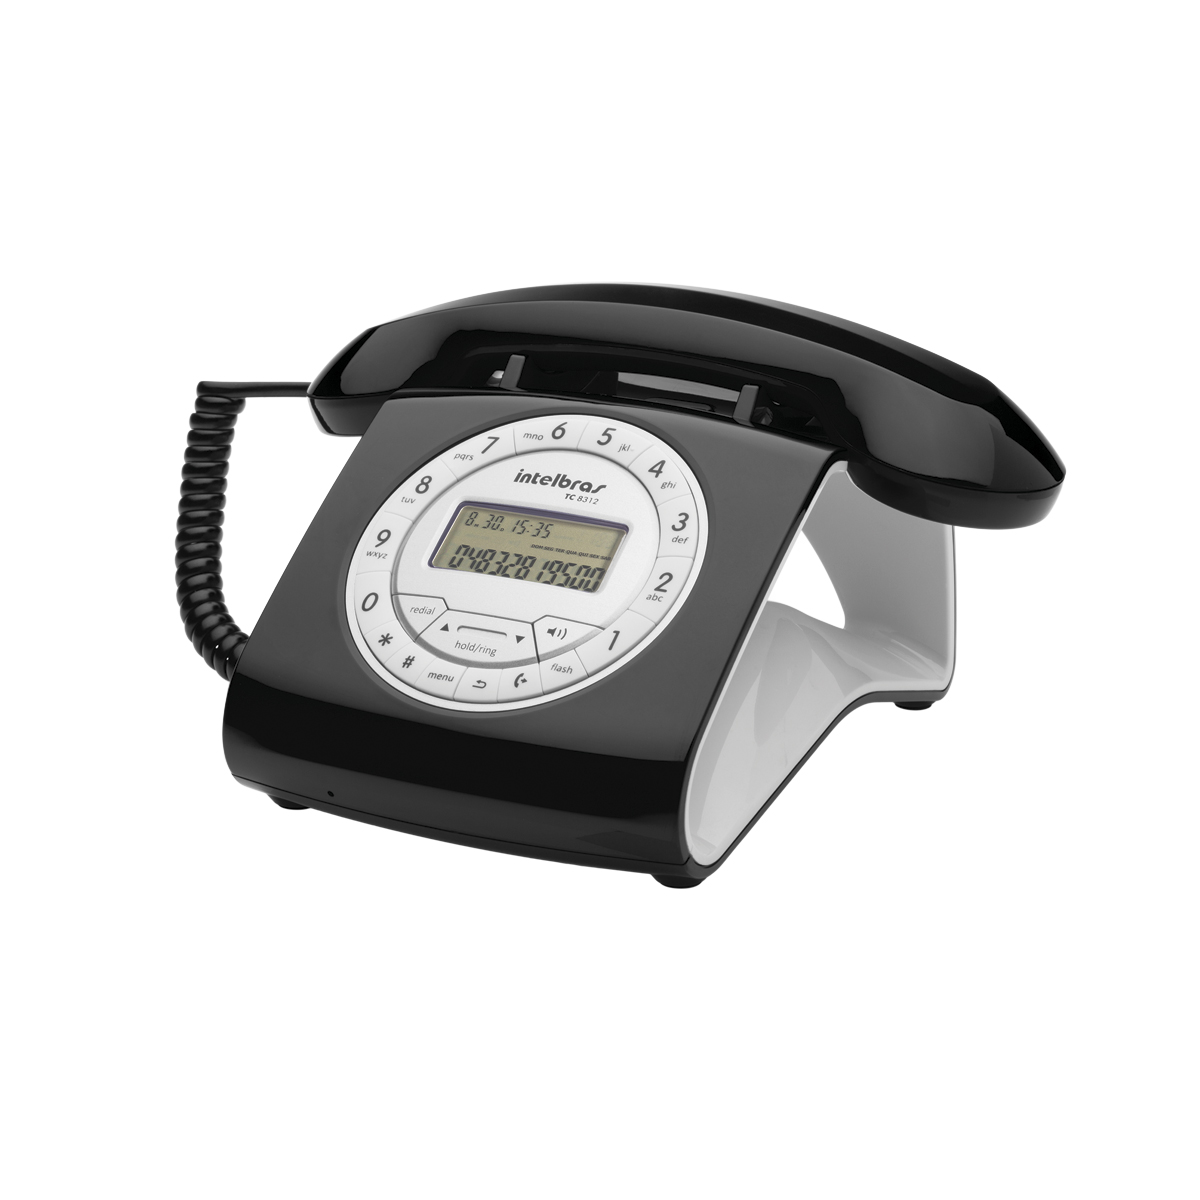 Telefone Com Fio Design Estilo Retrô Preto TC 8312 Intelbras